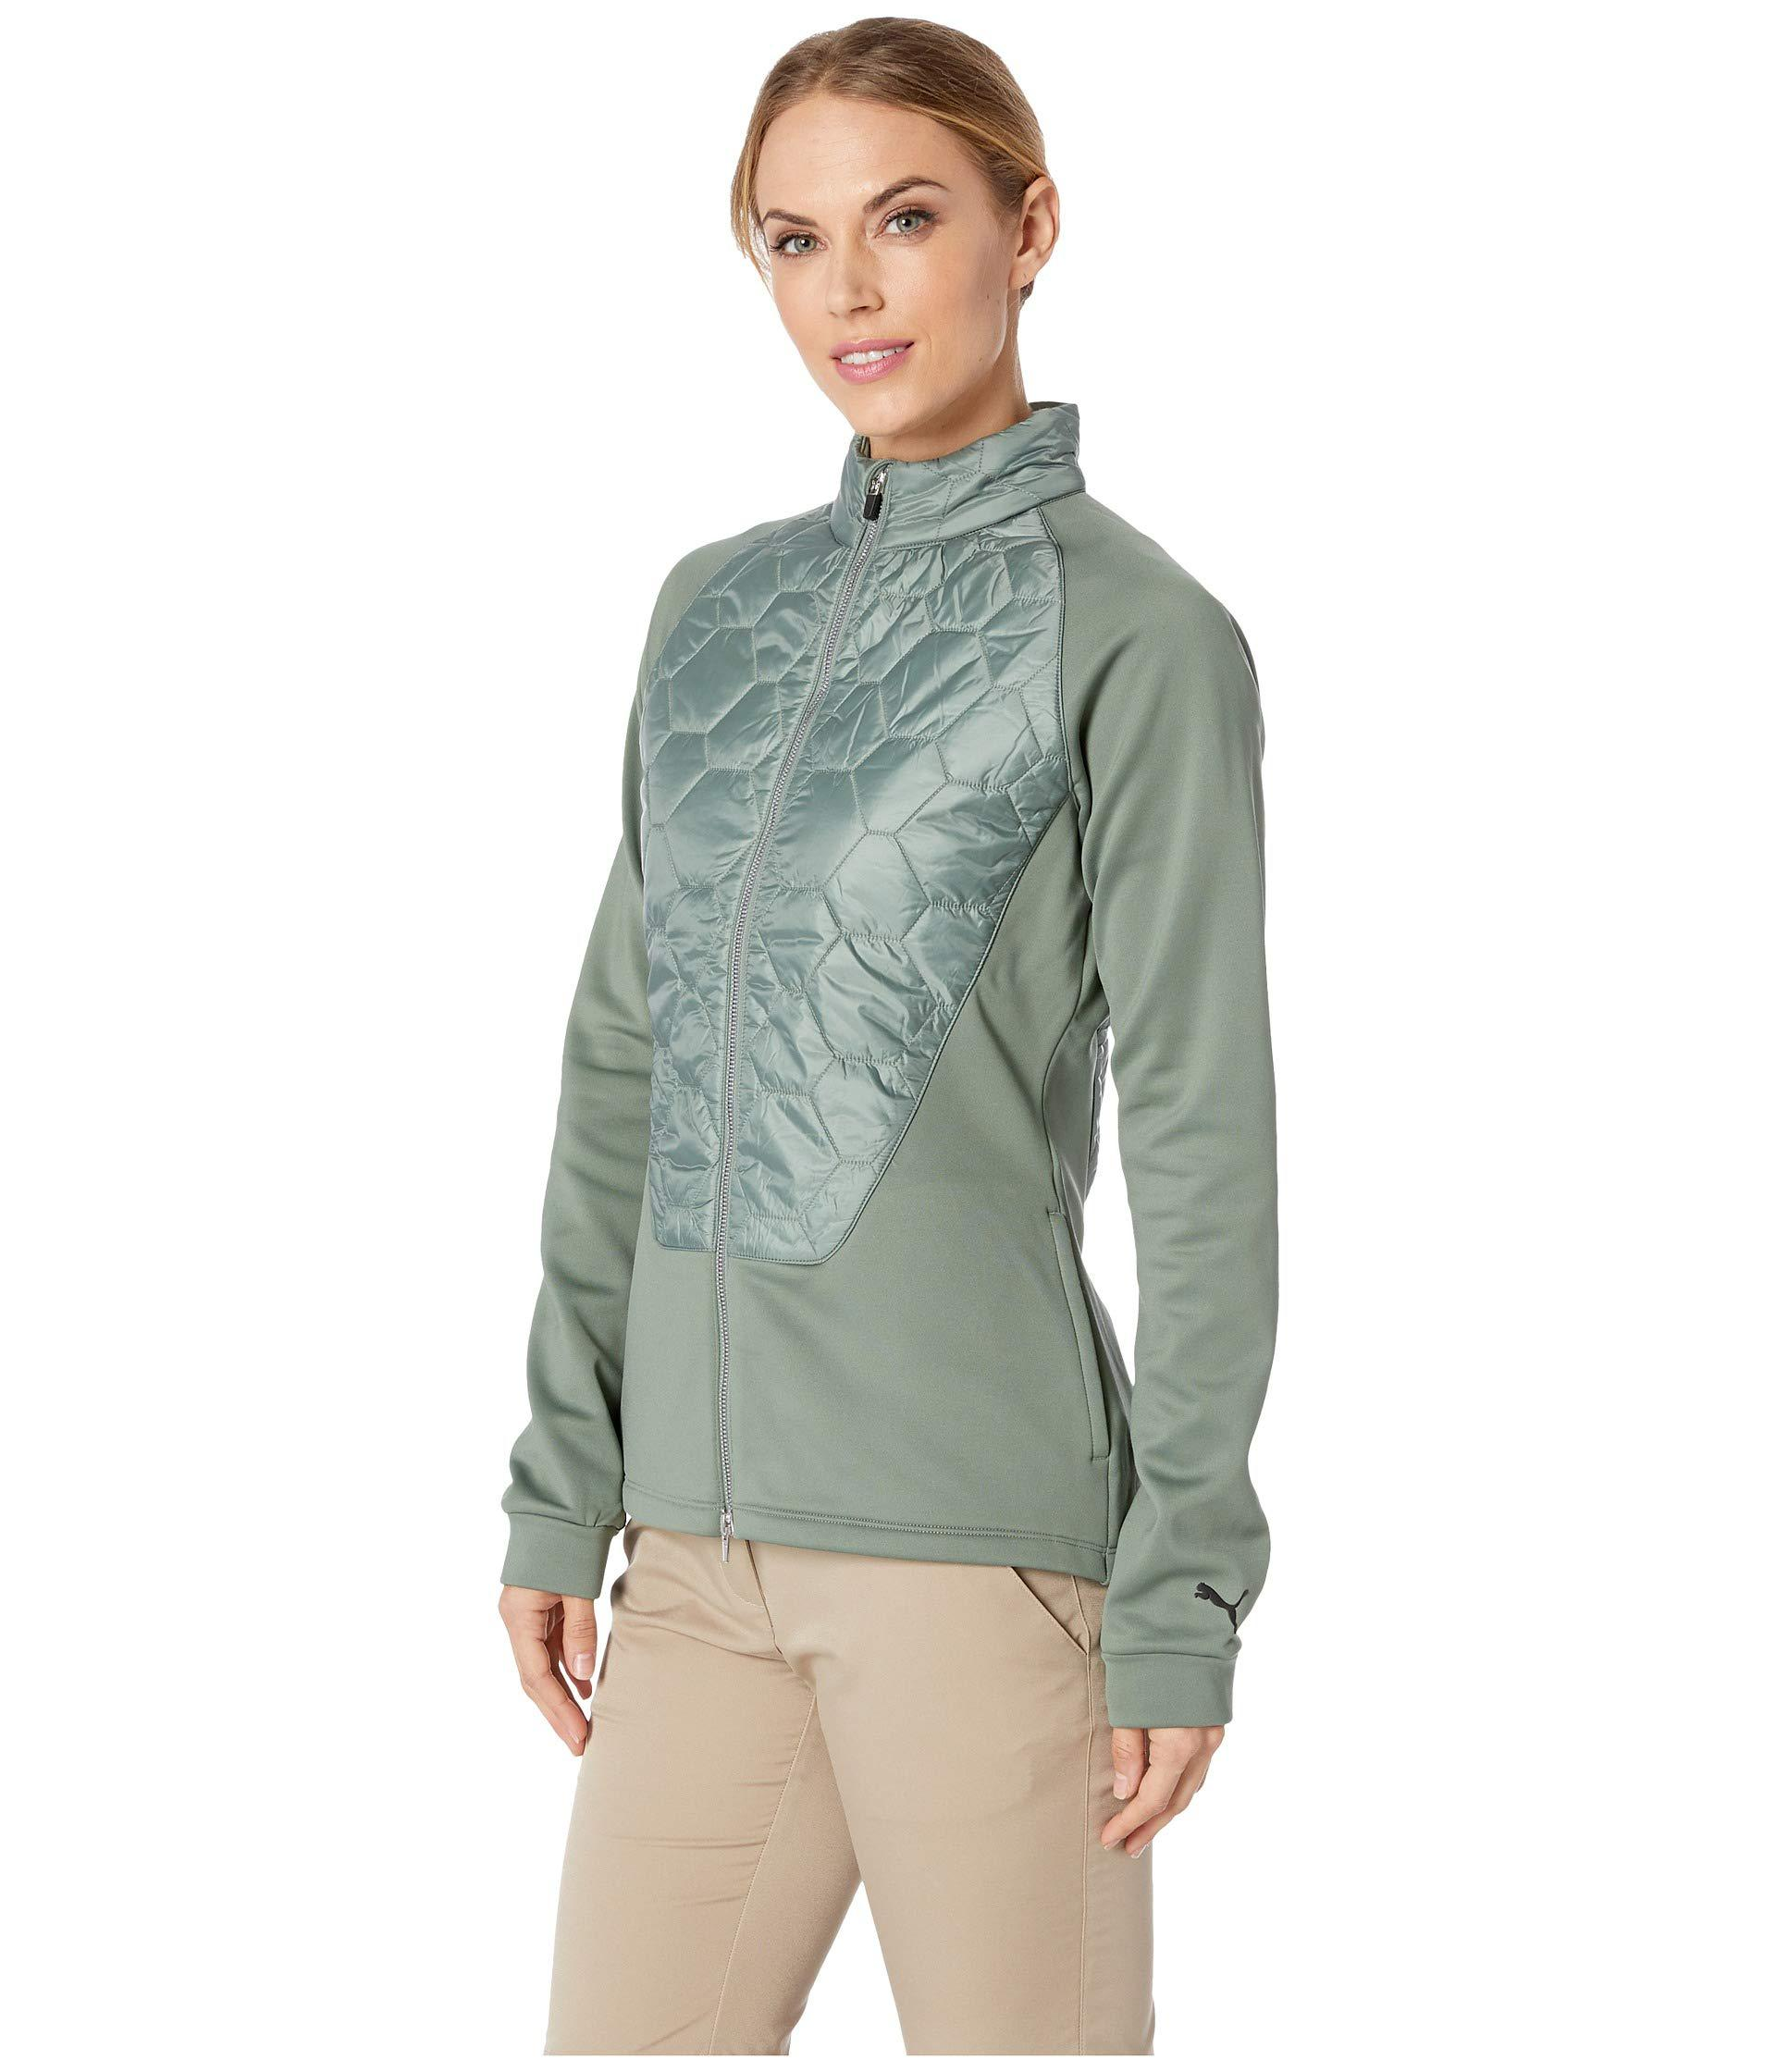 789b0e86727b Lyst - PUMA Pwrwarm Dassler Jacket (laurel Wreath) Women s Coat in Green